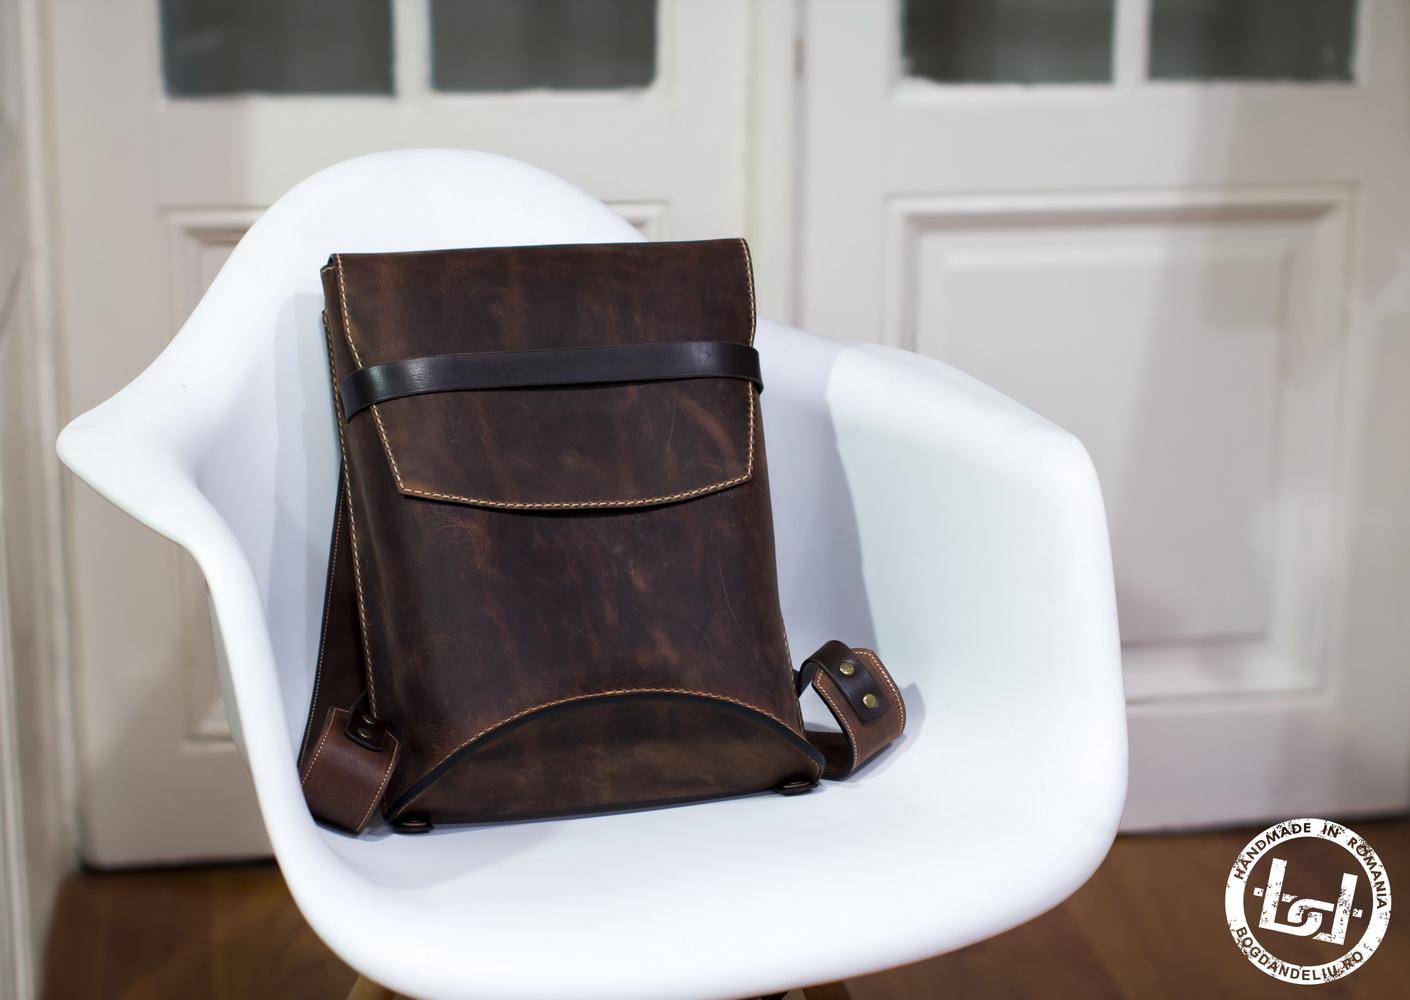 handmade-leather-bag-bogdan-deliu-dunetuareg-v3-3